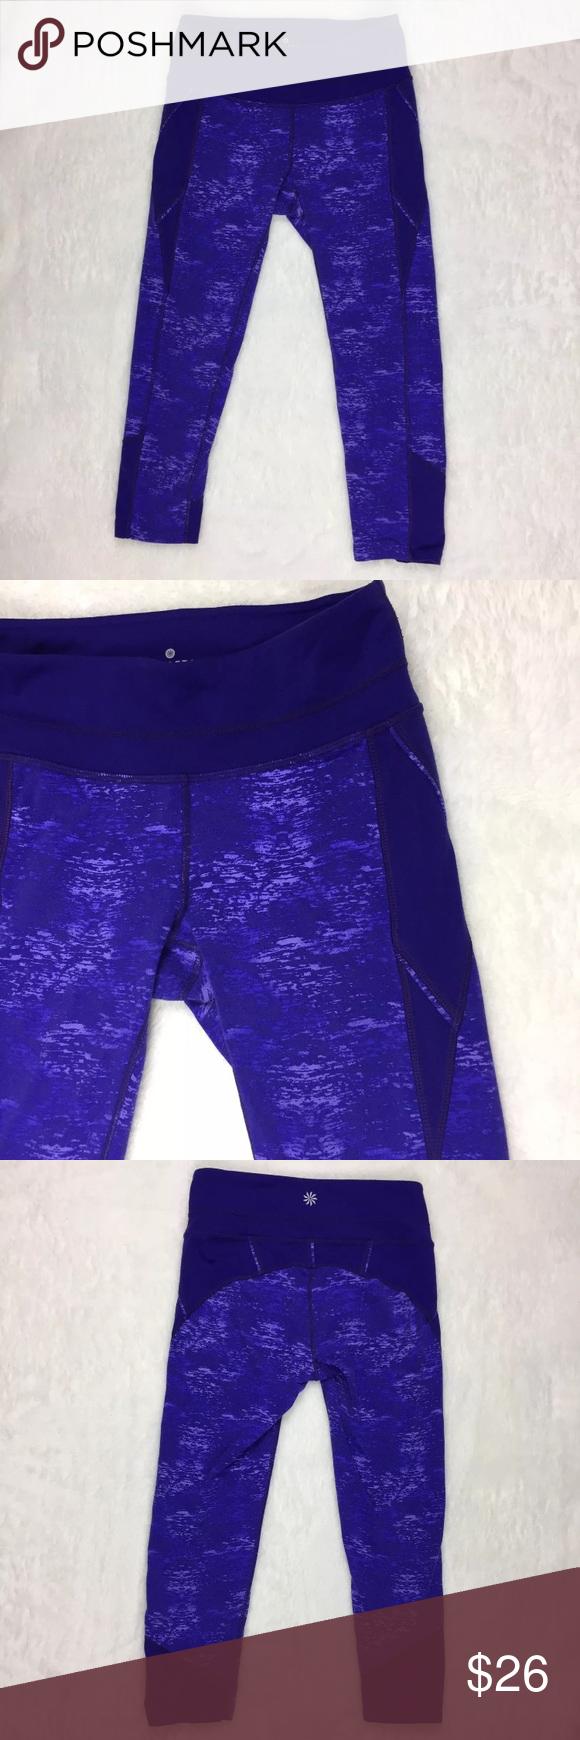 3119bcd7ec XS Athleta Purple Crush Connect Capri Pants Athleta purple Crush Connect  capri pants, size XS. Measurements: Waist 12